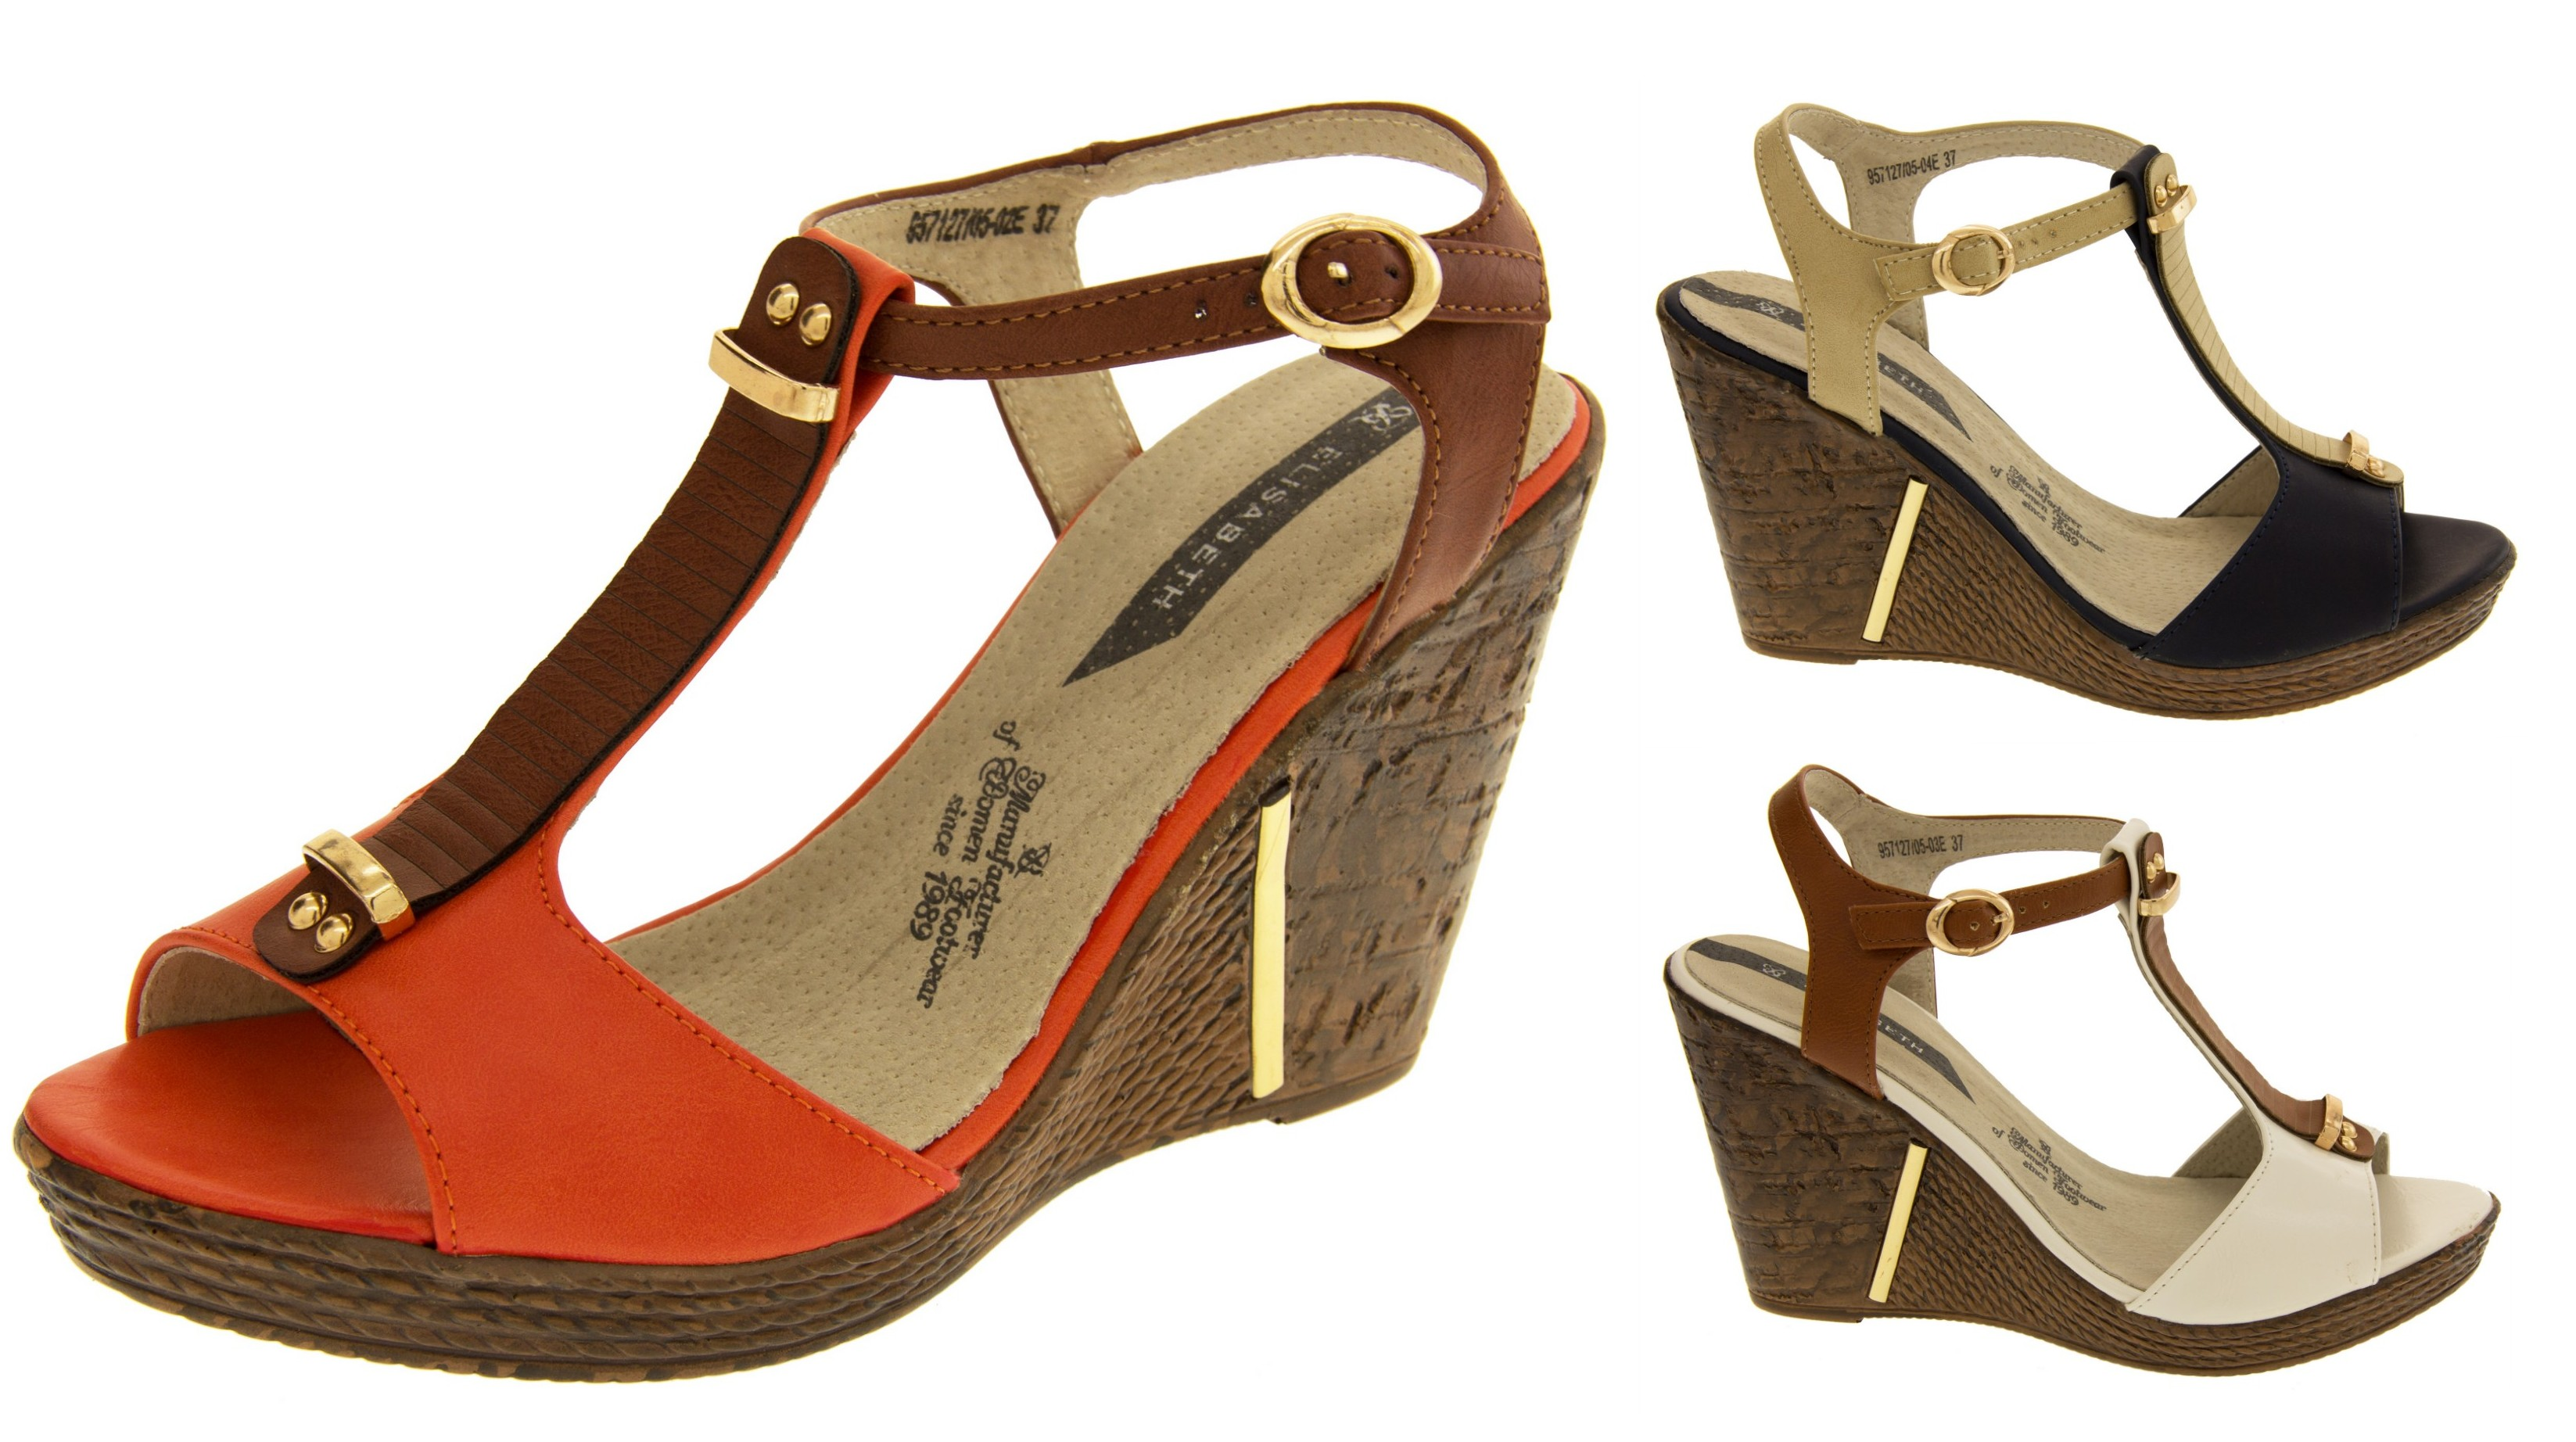 8 Womens Ladies Platform Wedge Peep Toe Ankle Strap Sandals Shoes Size 6